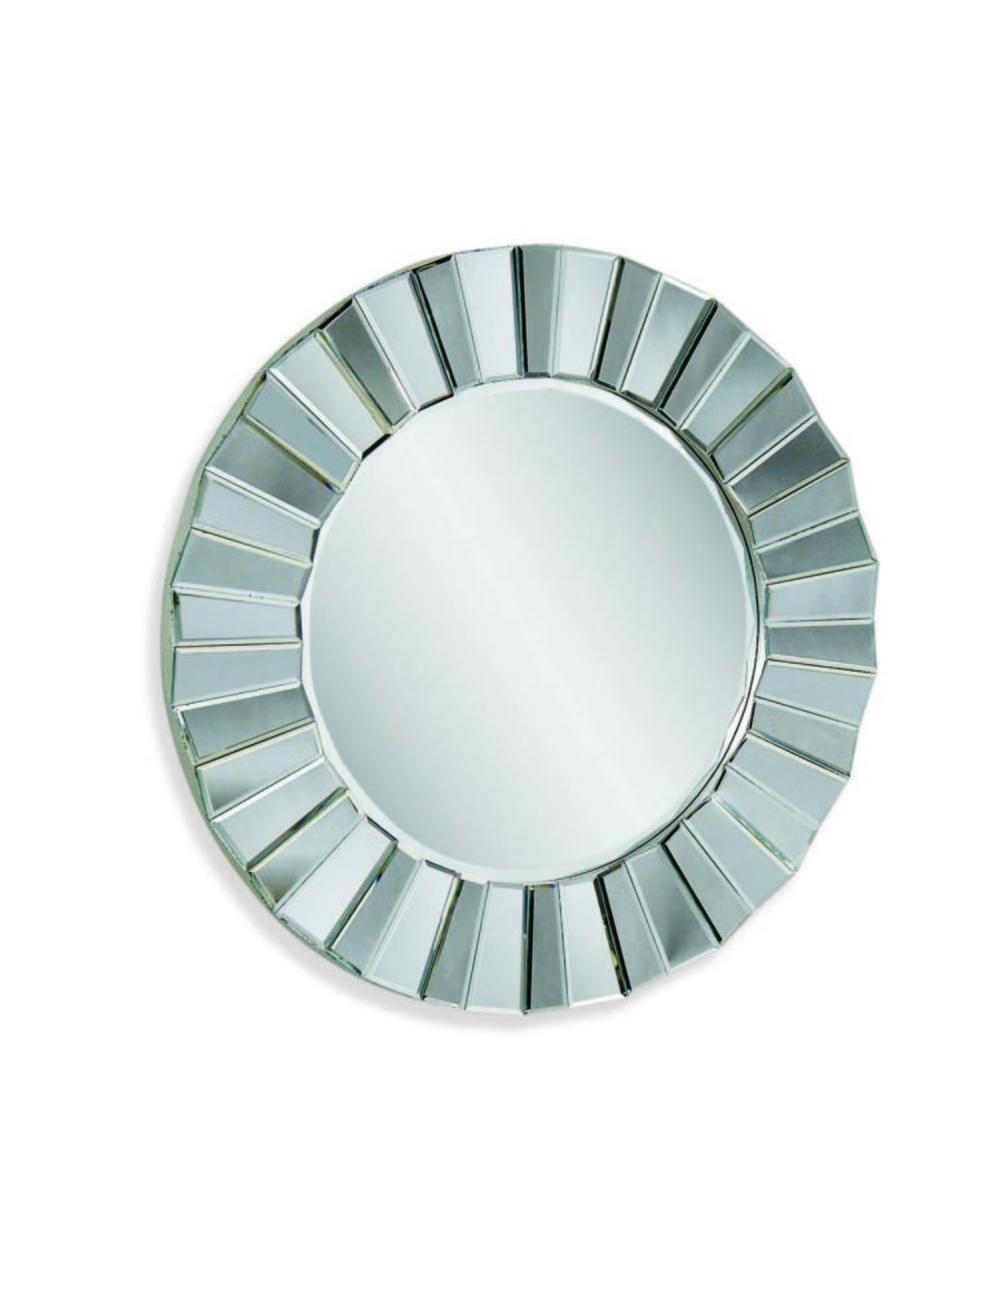 Bassett Mirror Company - Parker Wall Mirror